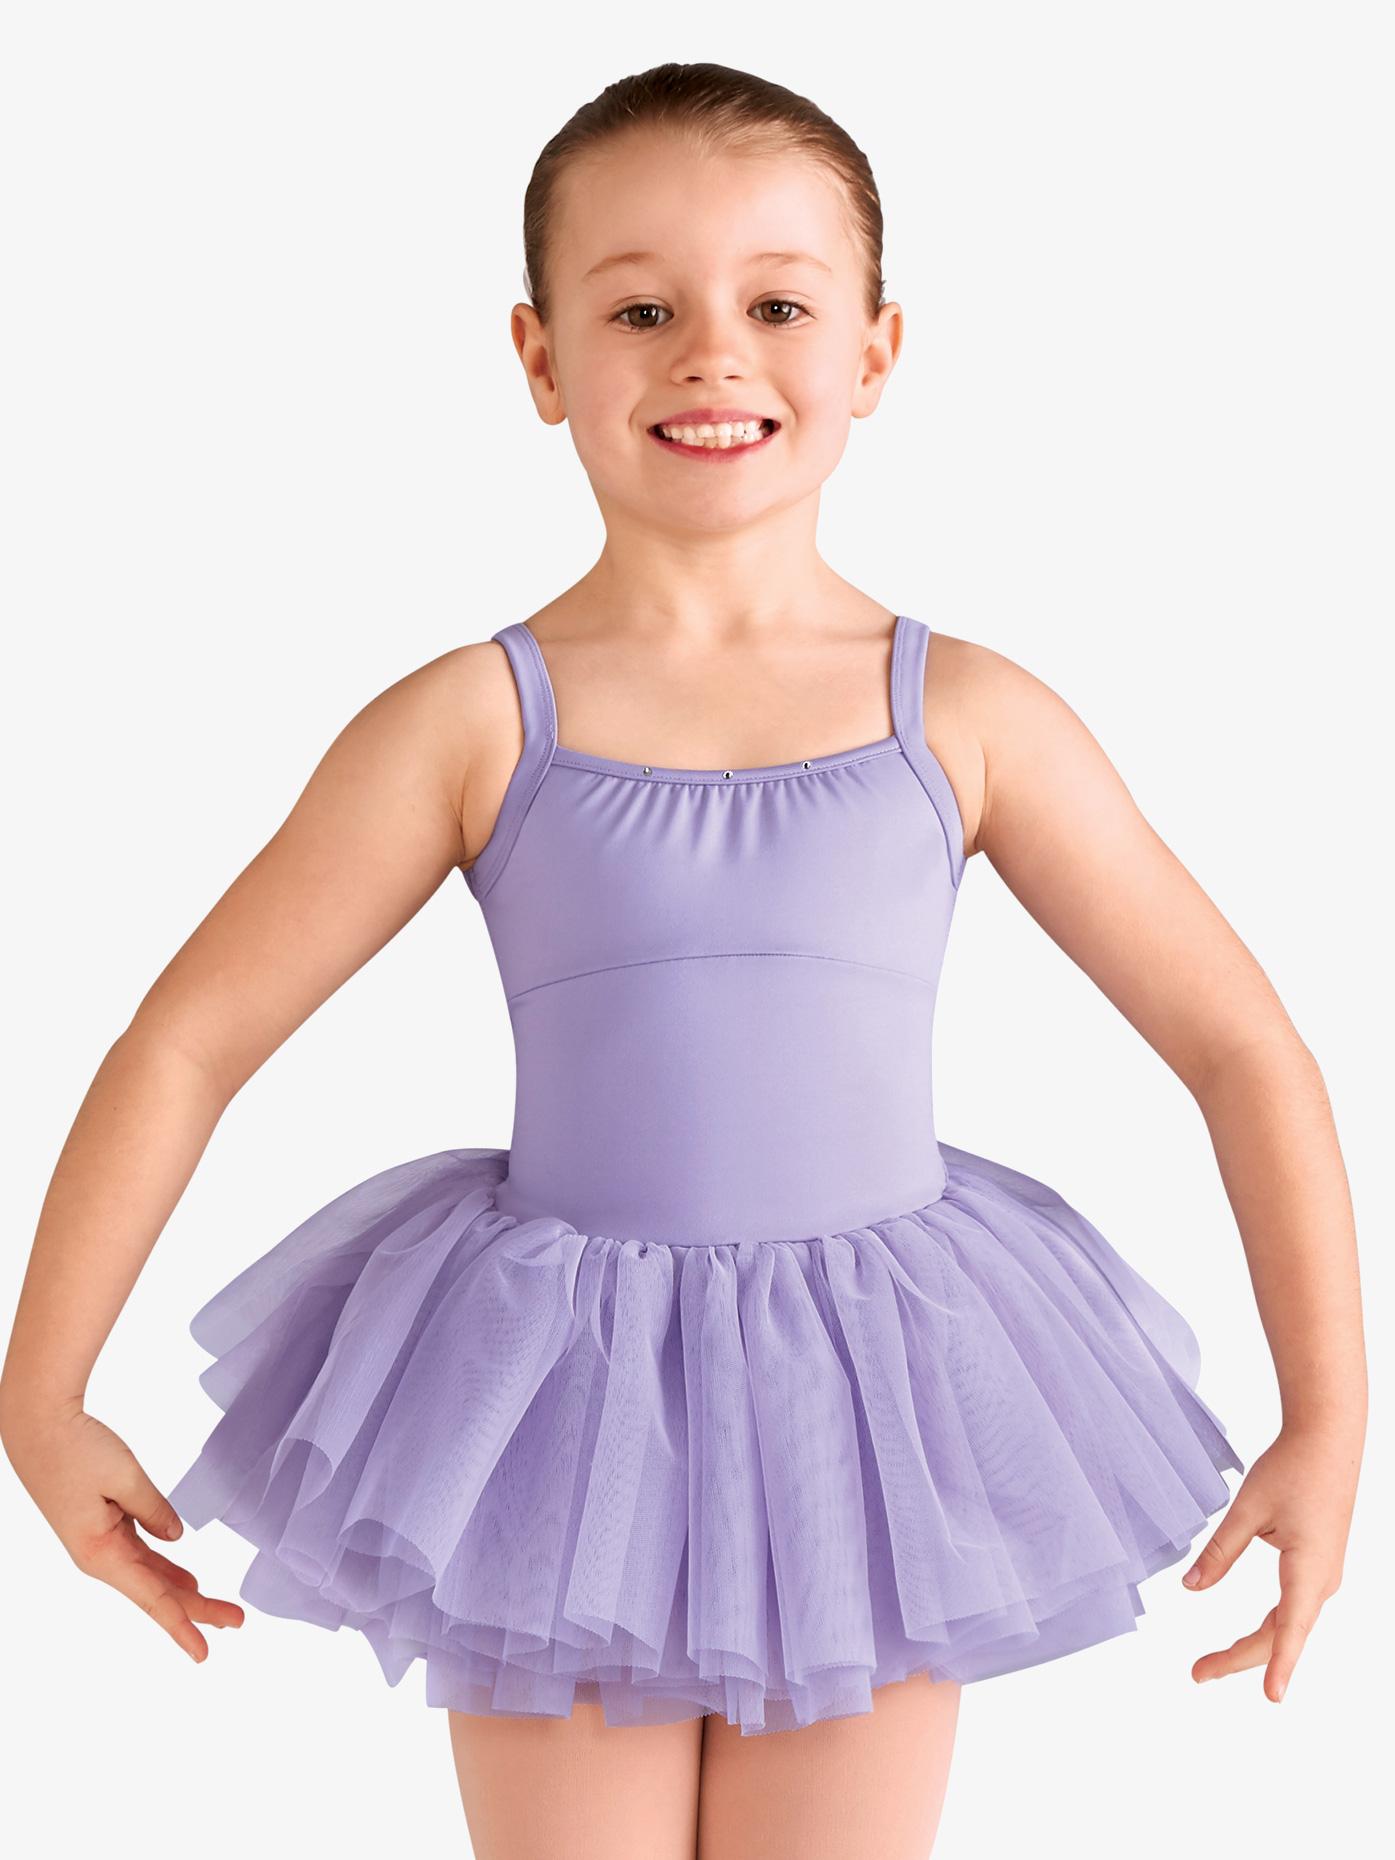 c3ee3ac50a74 Diamond Heart Mesh Camisole Ballet Tutu Dress - Ballet Lyrical ...